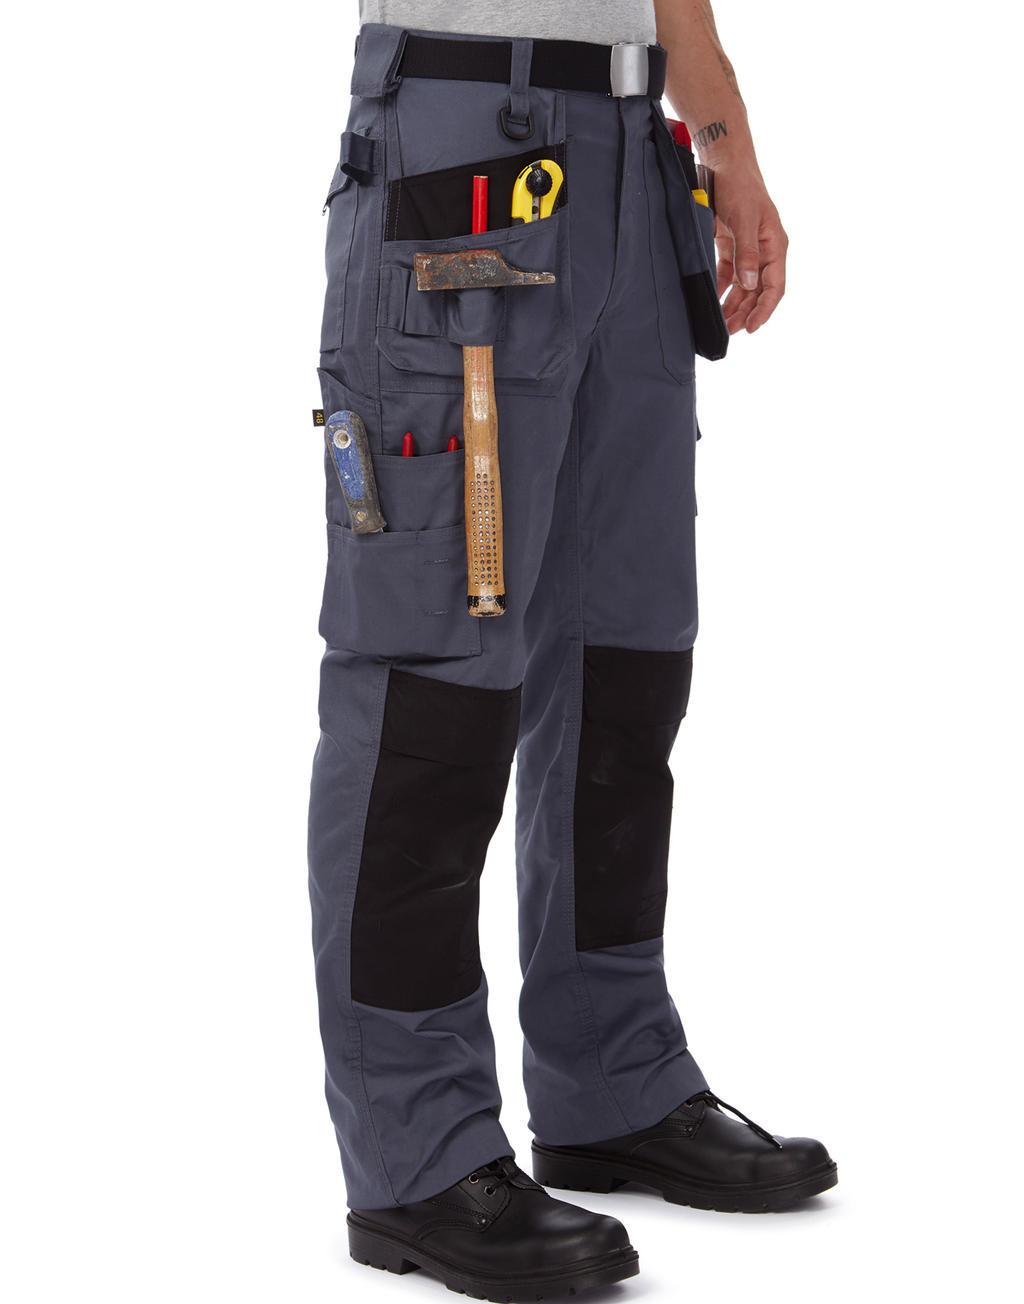 B&C Pro Performance Pro Workwear Trousers